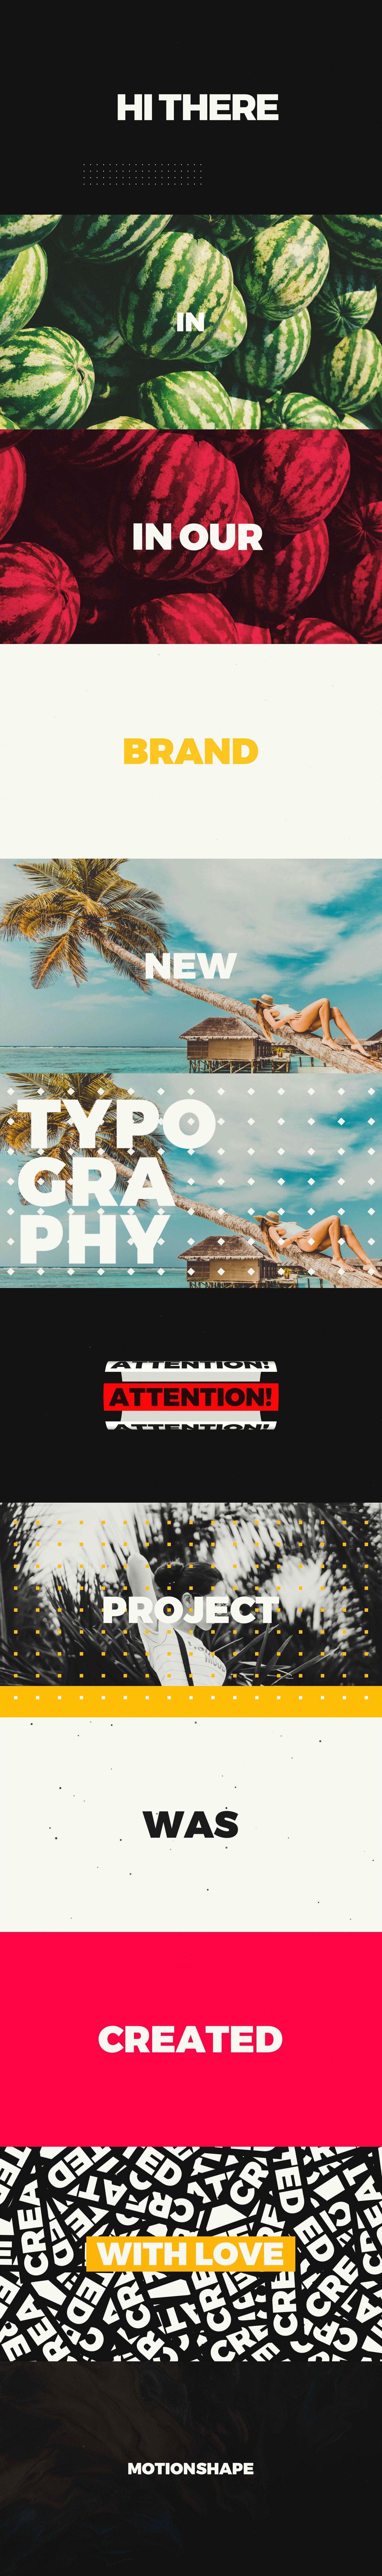 Creative Short Typo Opener - 2